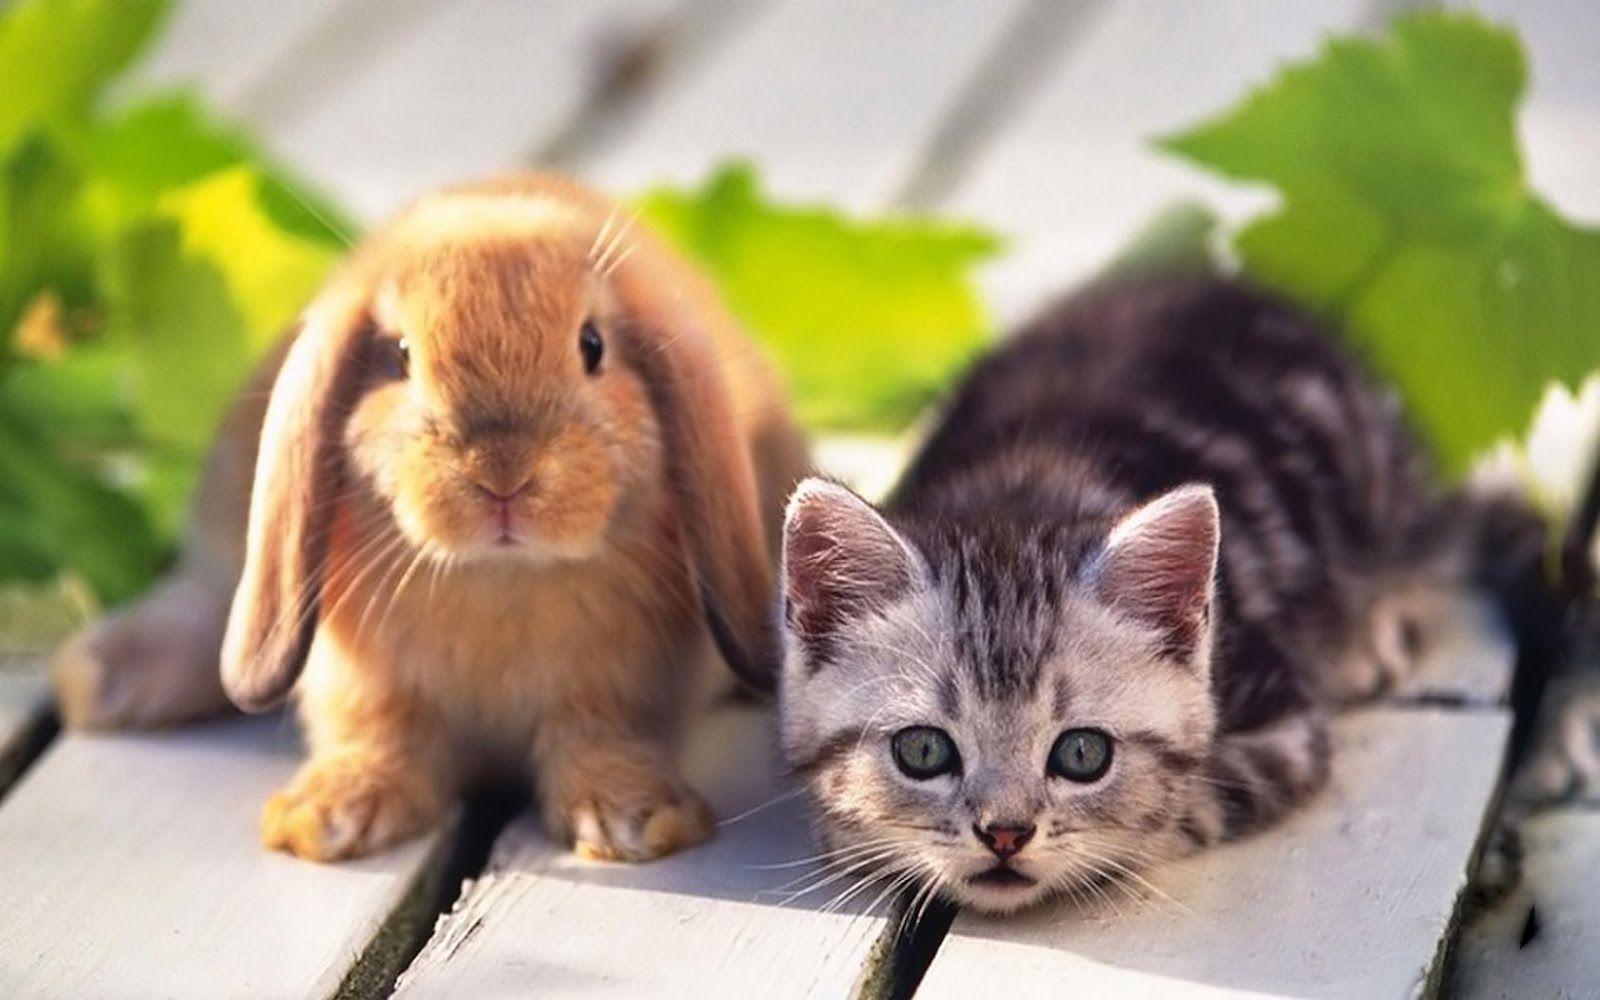 white rabbit images